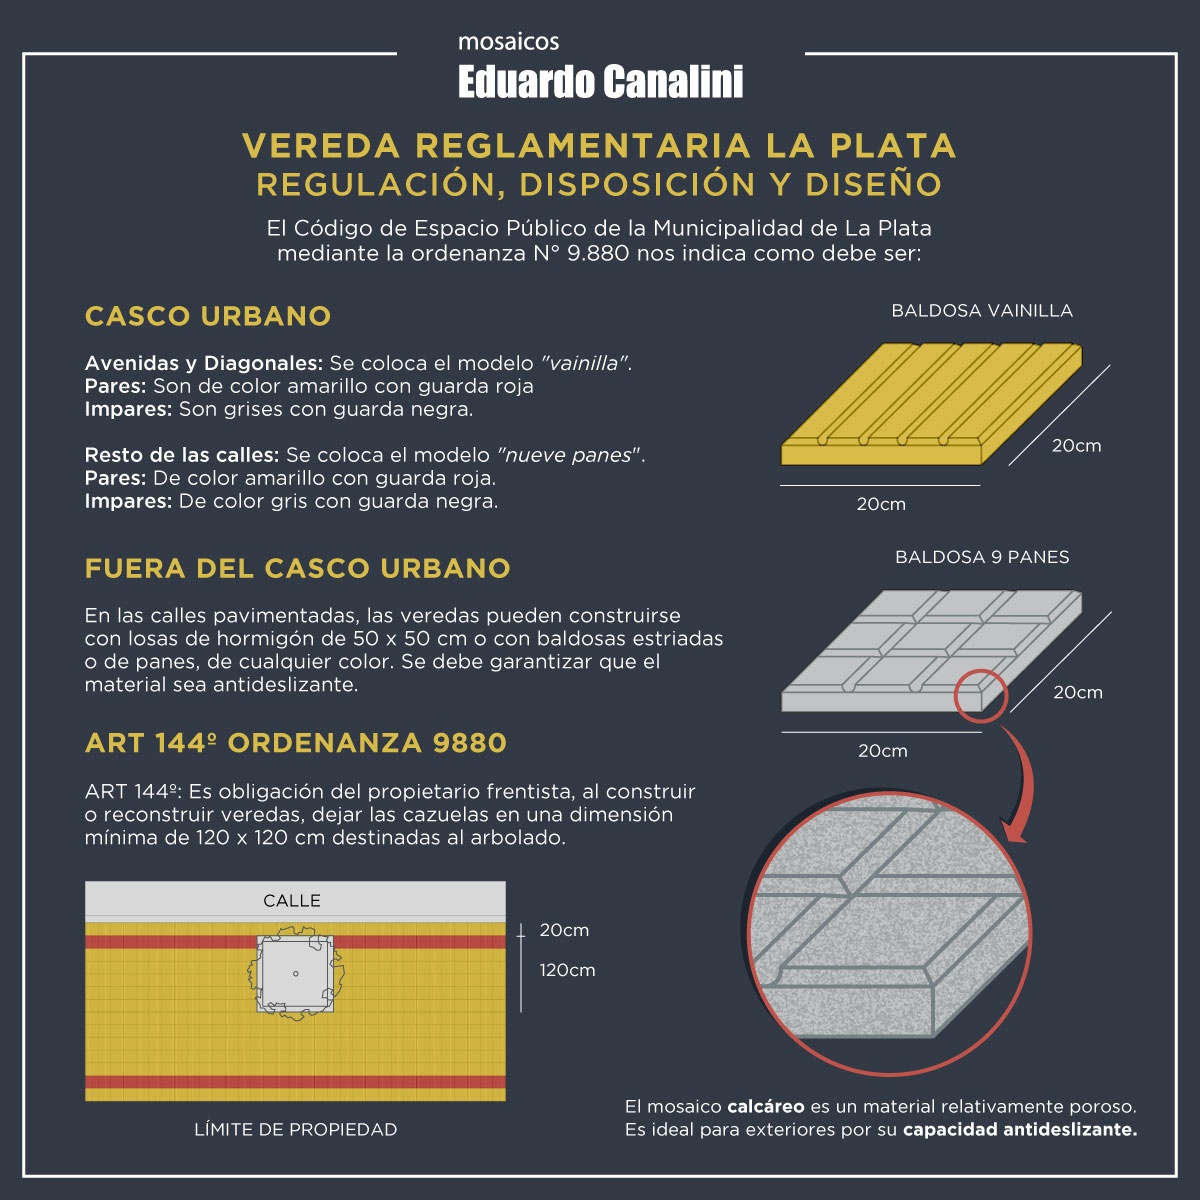 Vereda reglamentaria La Plata